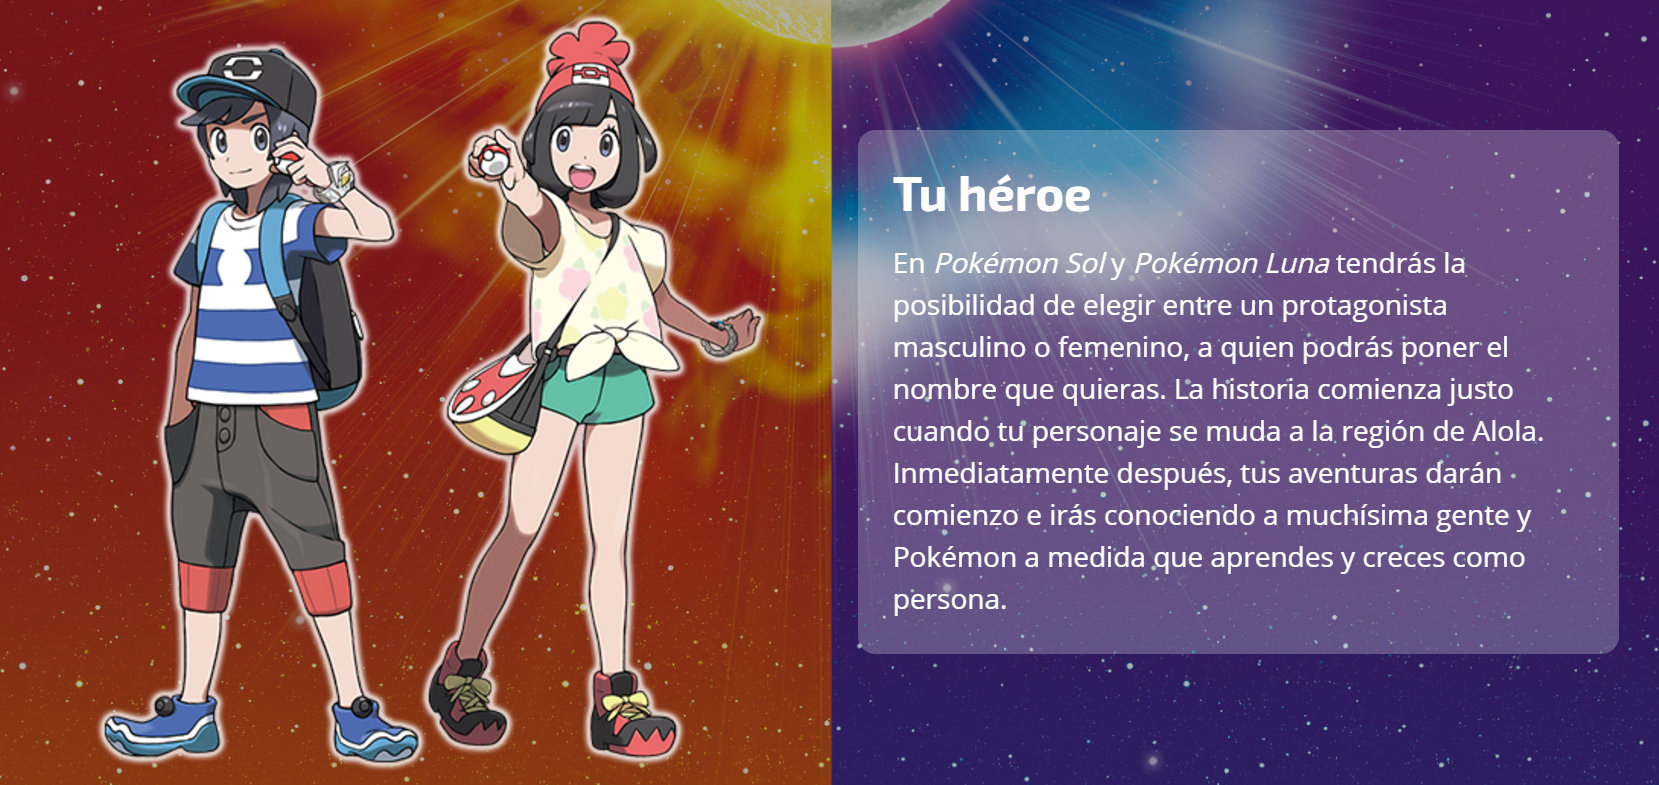 profesor-oak-pokemon-sun-moon-4